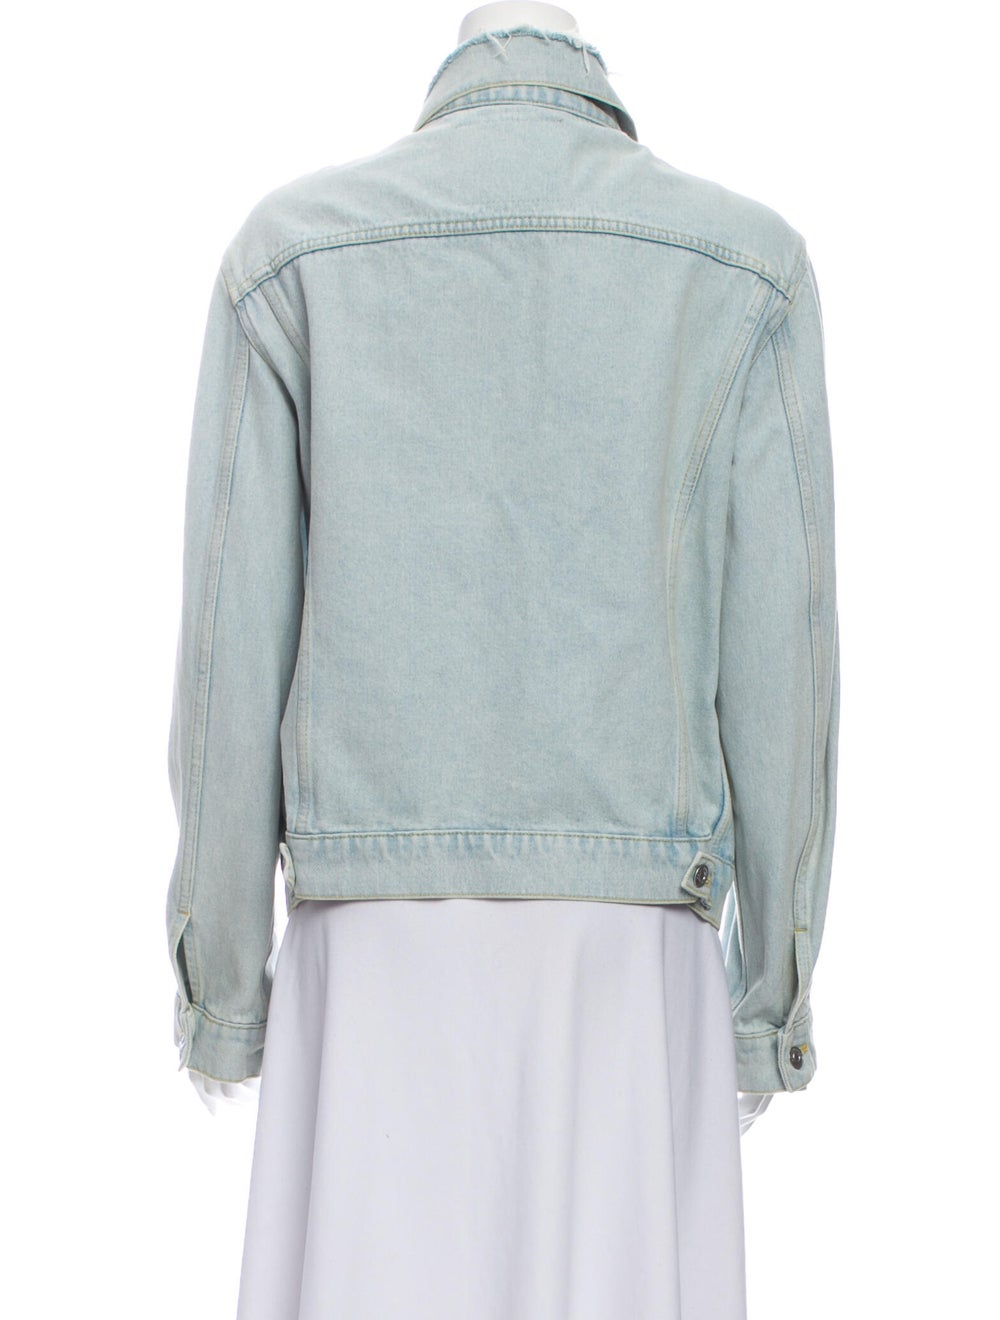 Balenciaga 2017 Denim Jacket Denim - image 3